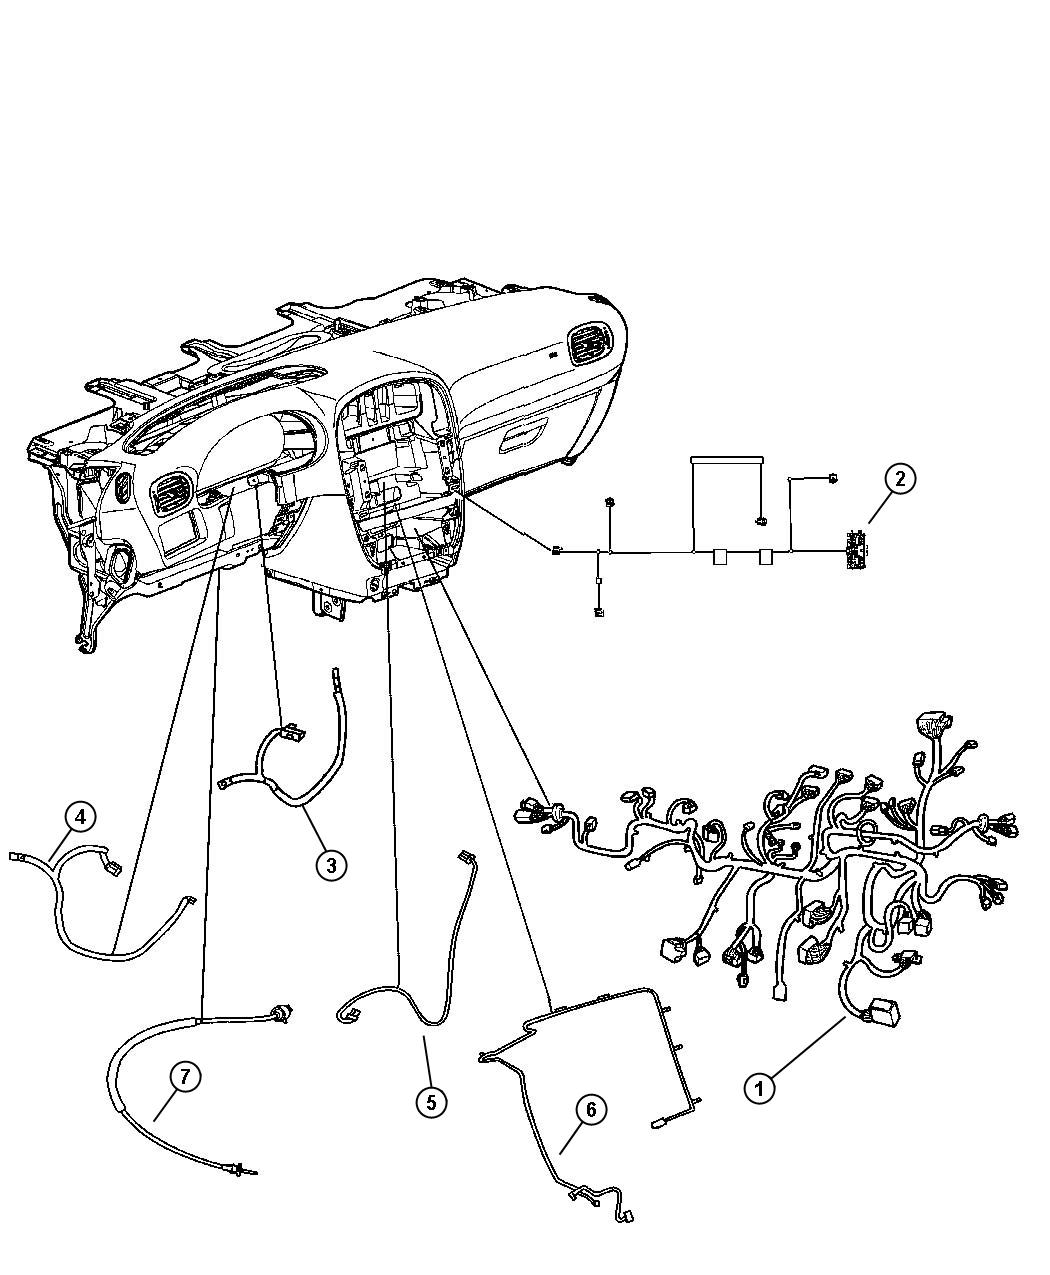 Radio Wiring Diagram On Chrysler Uconnect